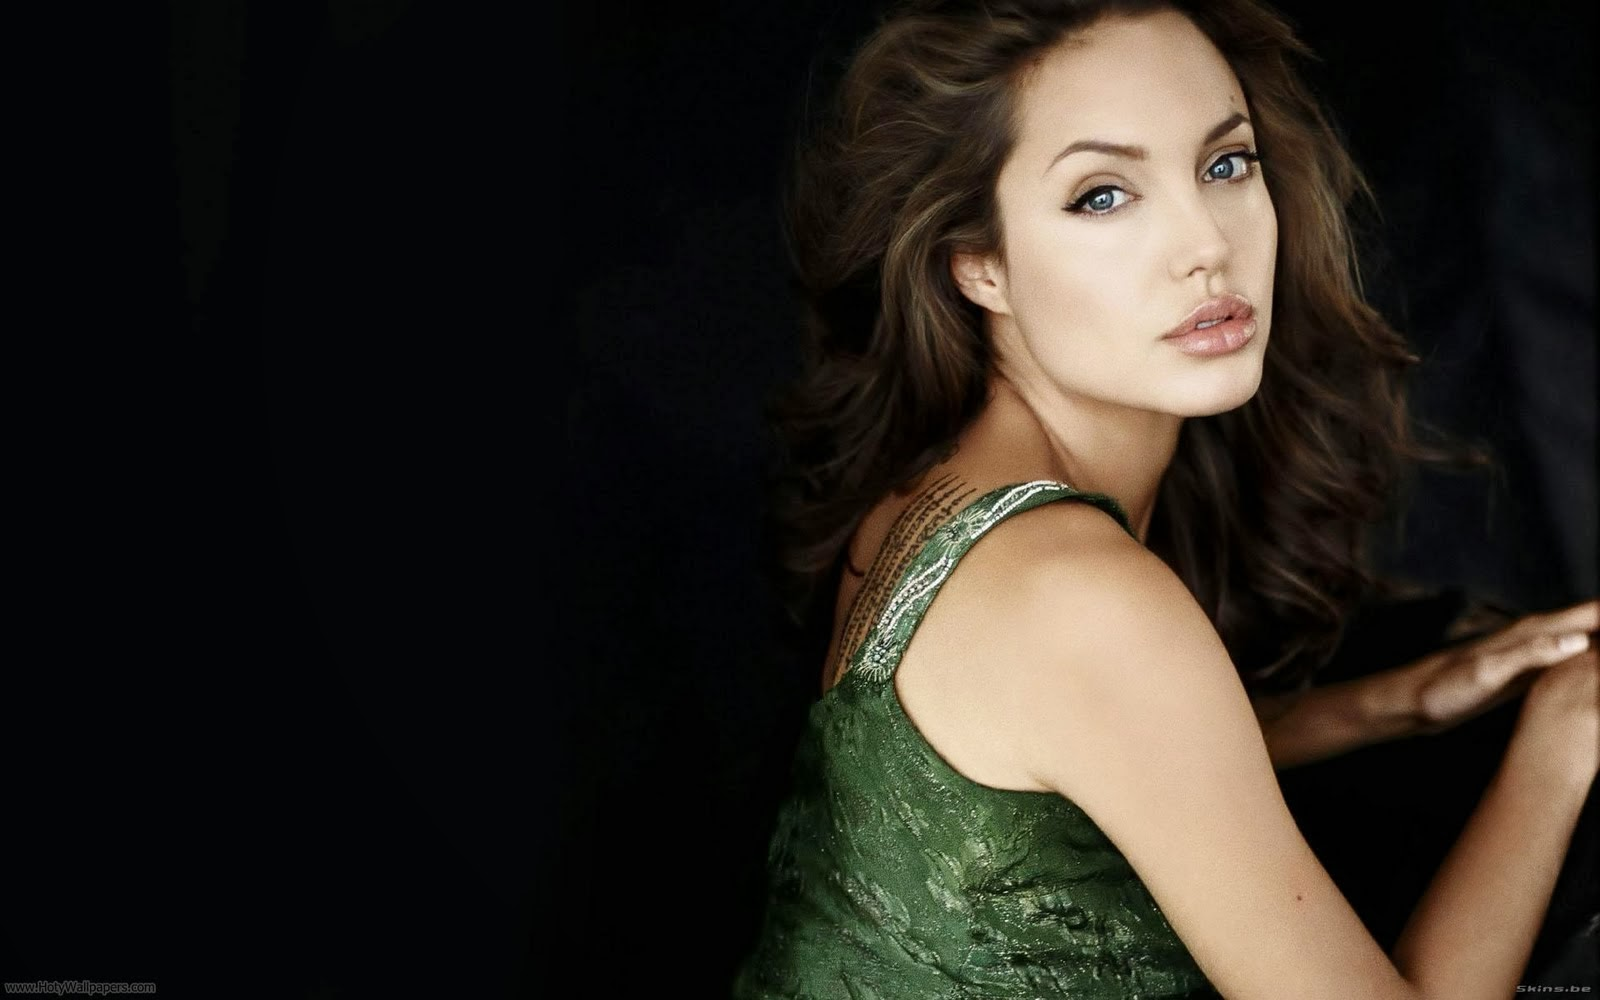 Angelina jolie original sin hd slow motion 6